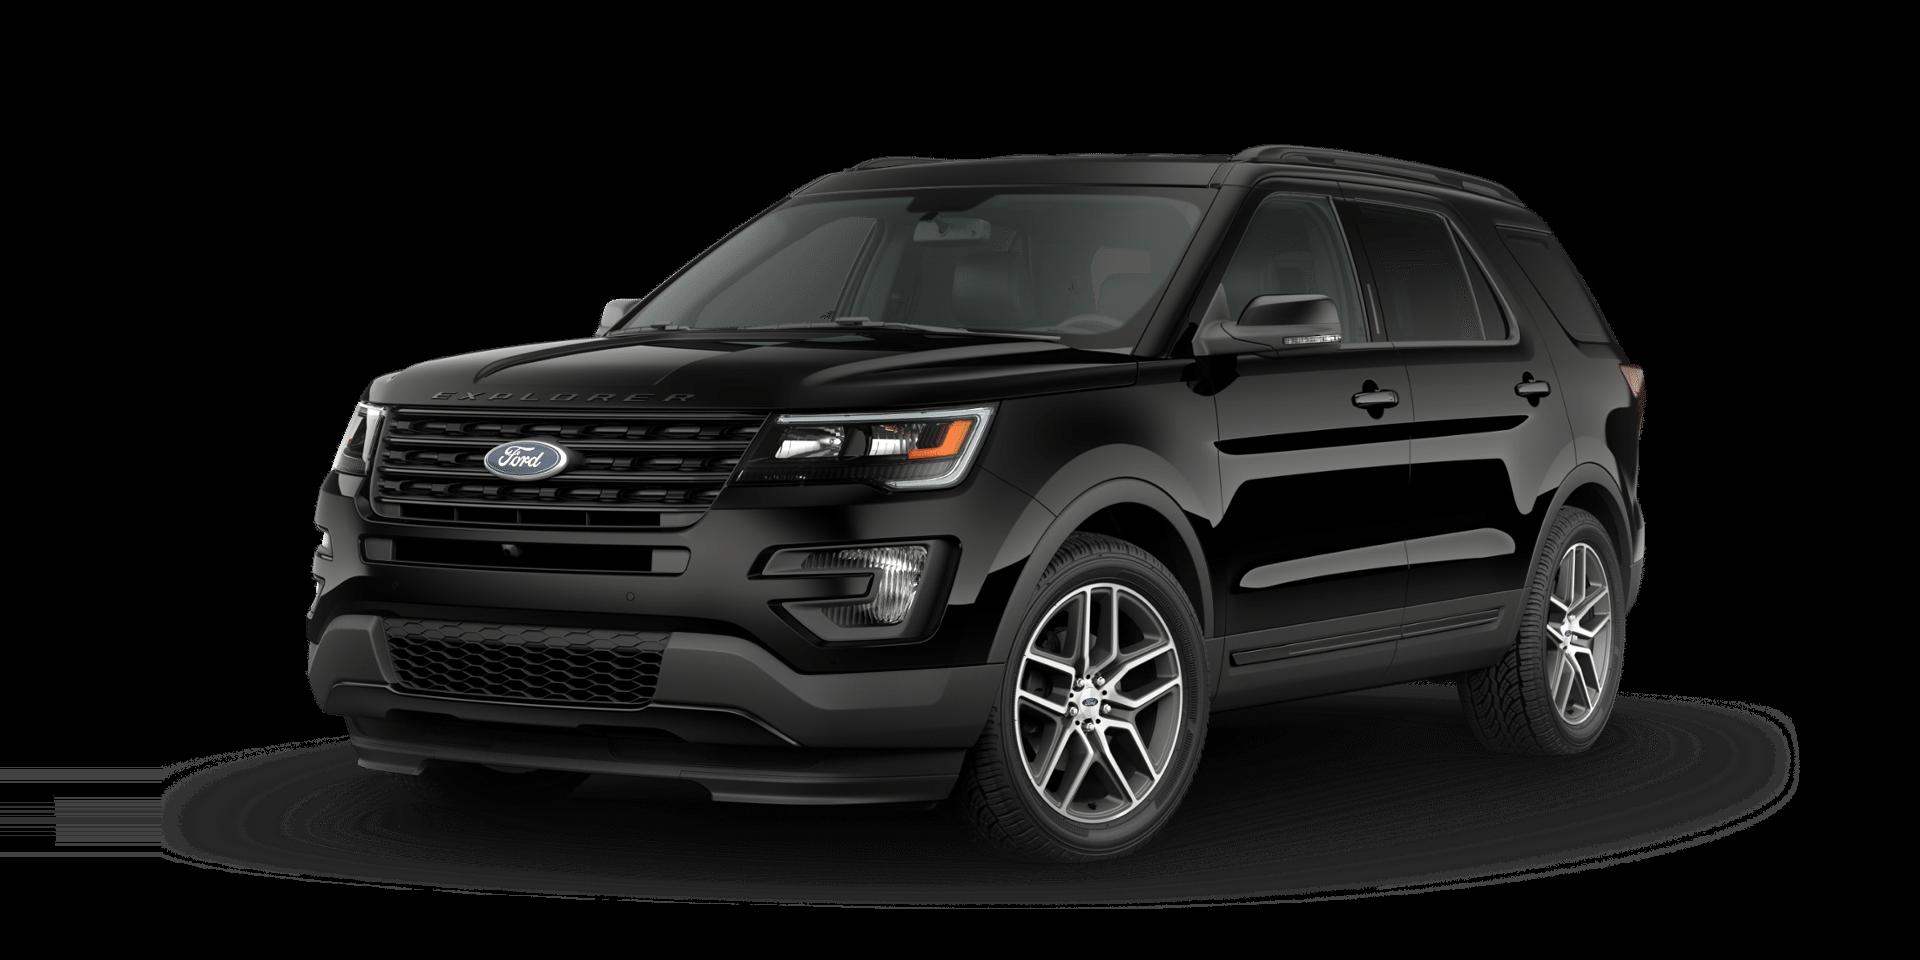 2017 Ford Explorer Build & Price Ford explorer, Ford